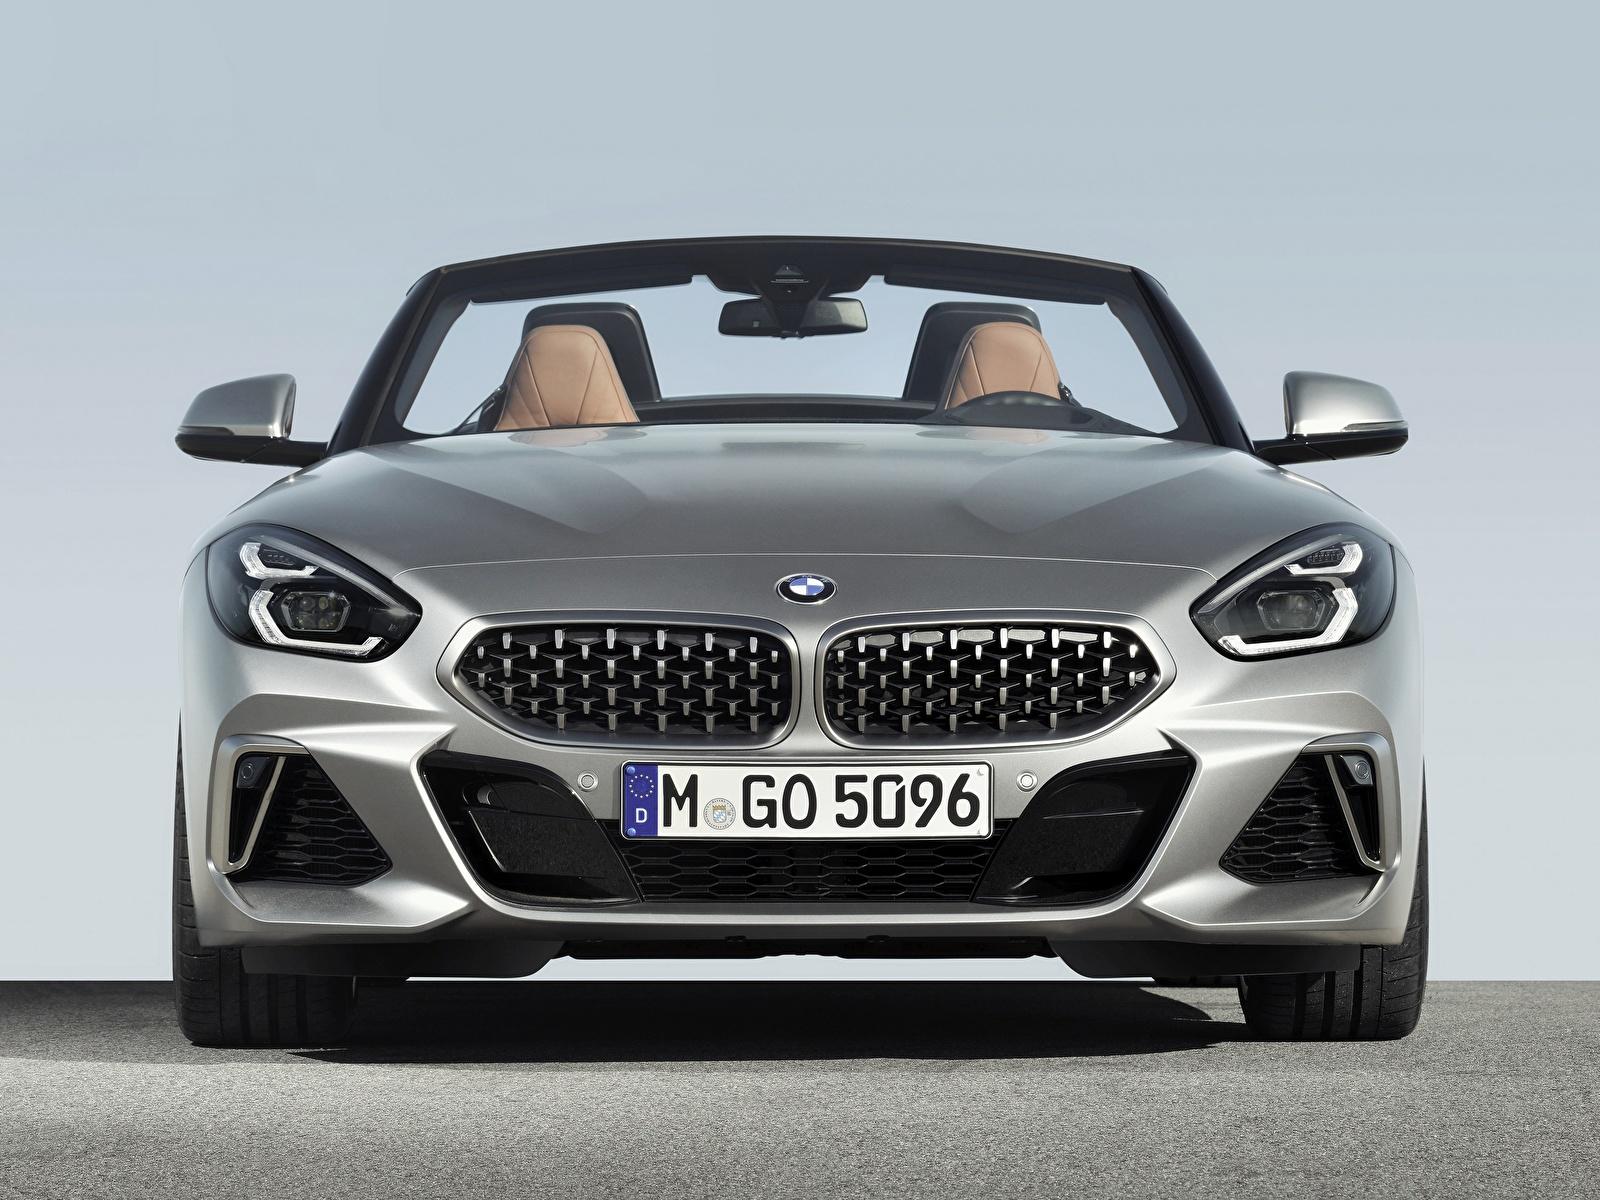 Обои для рабочего стола BMW Z4 M40i Z4 2019 G29 Родстер серебристая авто Спереди 1600x1200 БМВ серебряный серебряная Серебристый машина машины автомобиль Автомобили